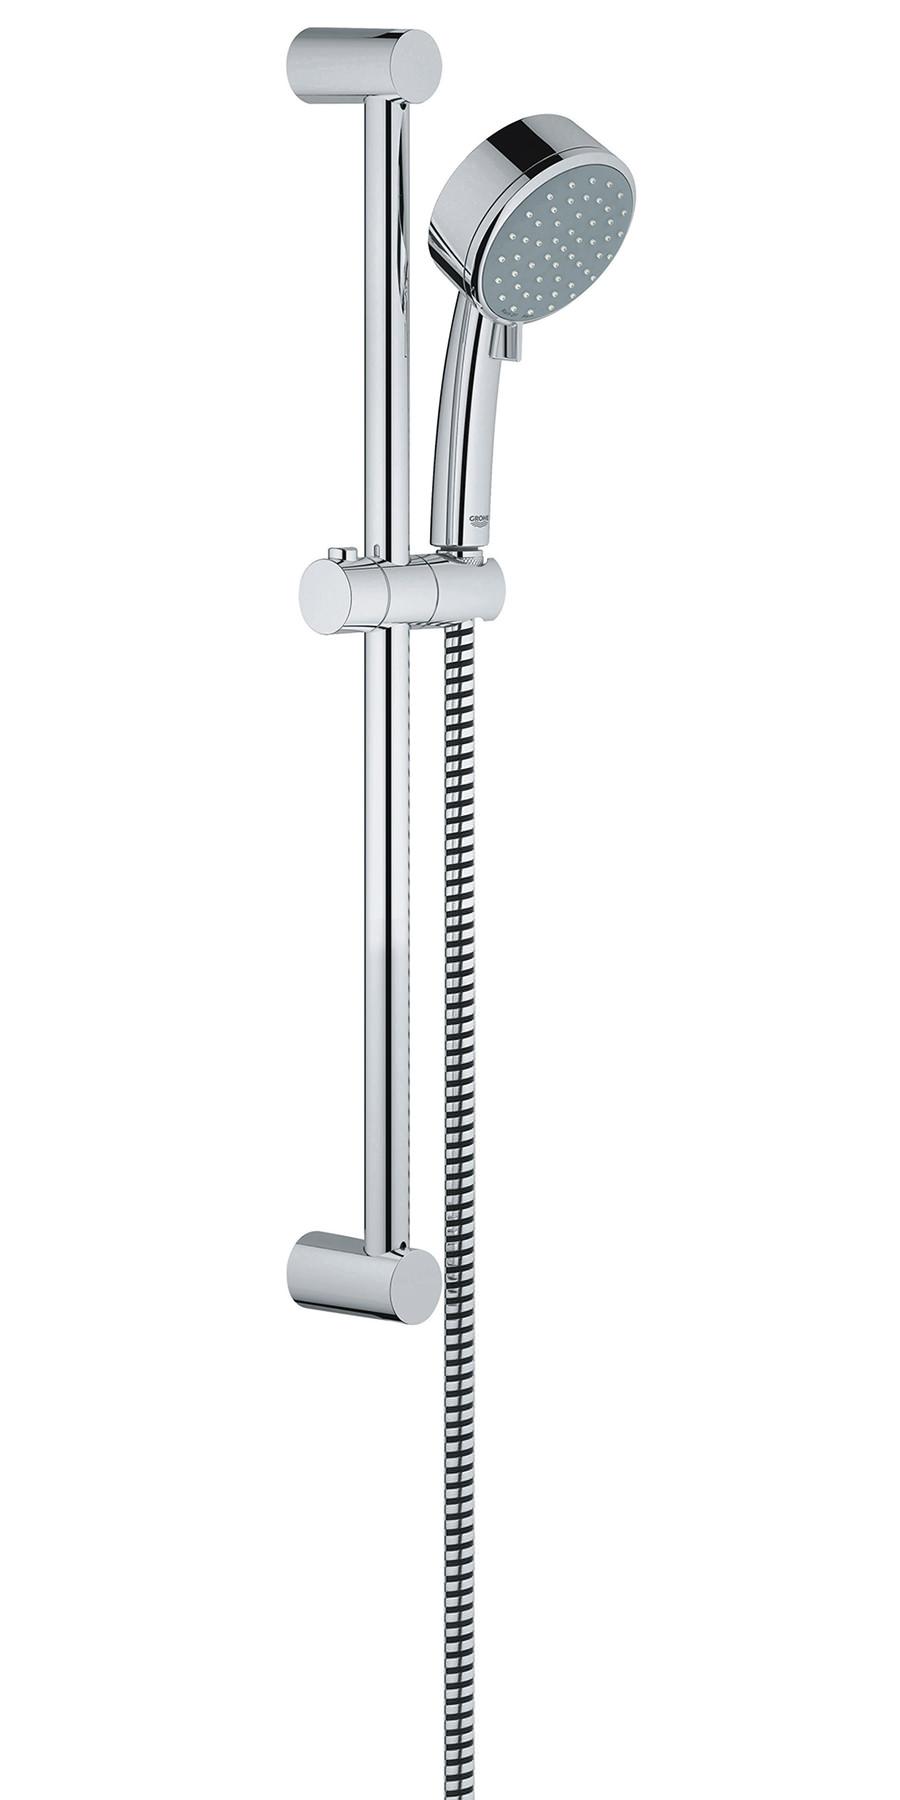 grohe new tempesta cosmopolitan chrome shower set 27578001. Black Bedroom Furniture Sets. Home Design Ideas